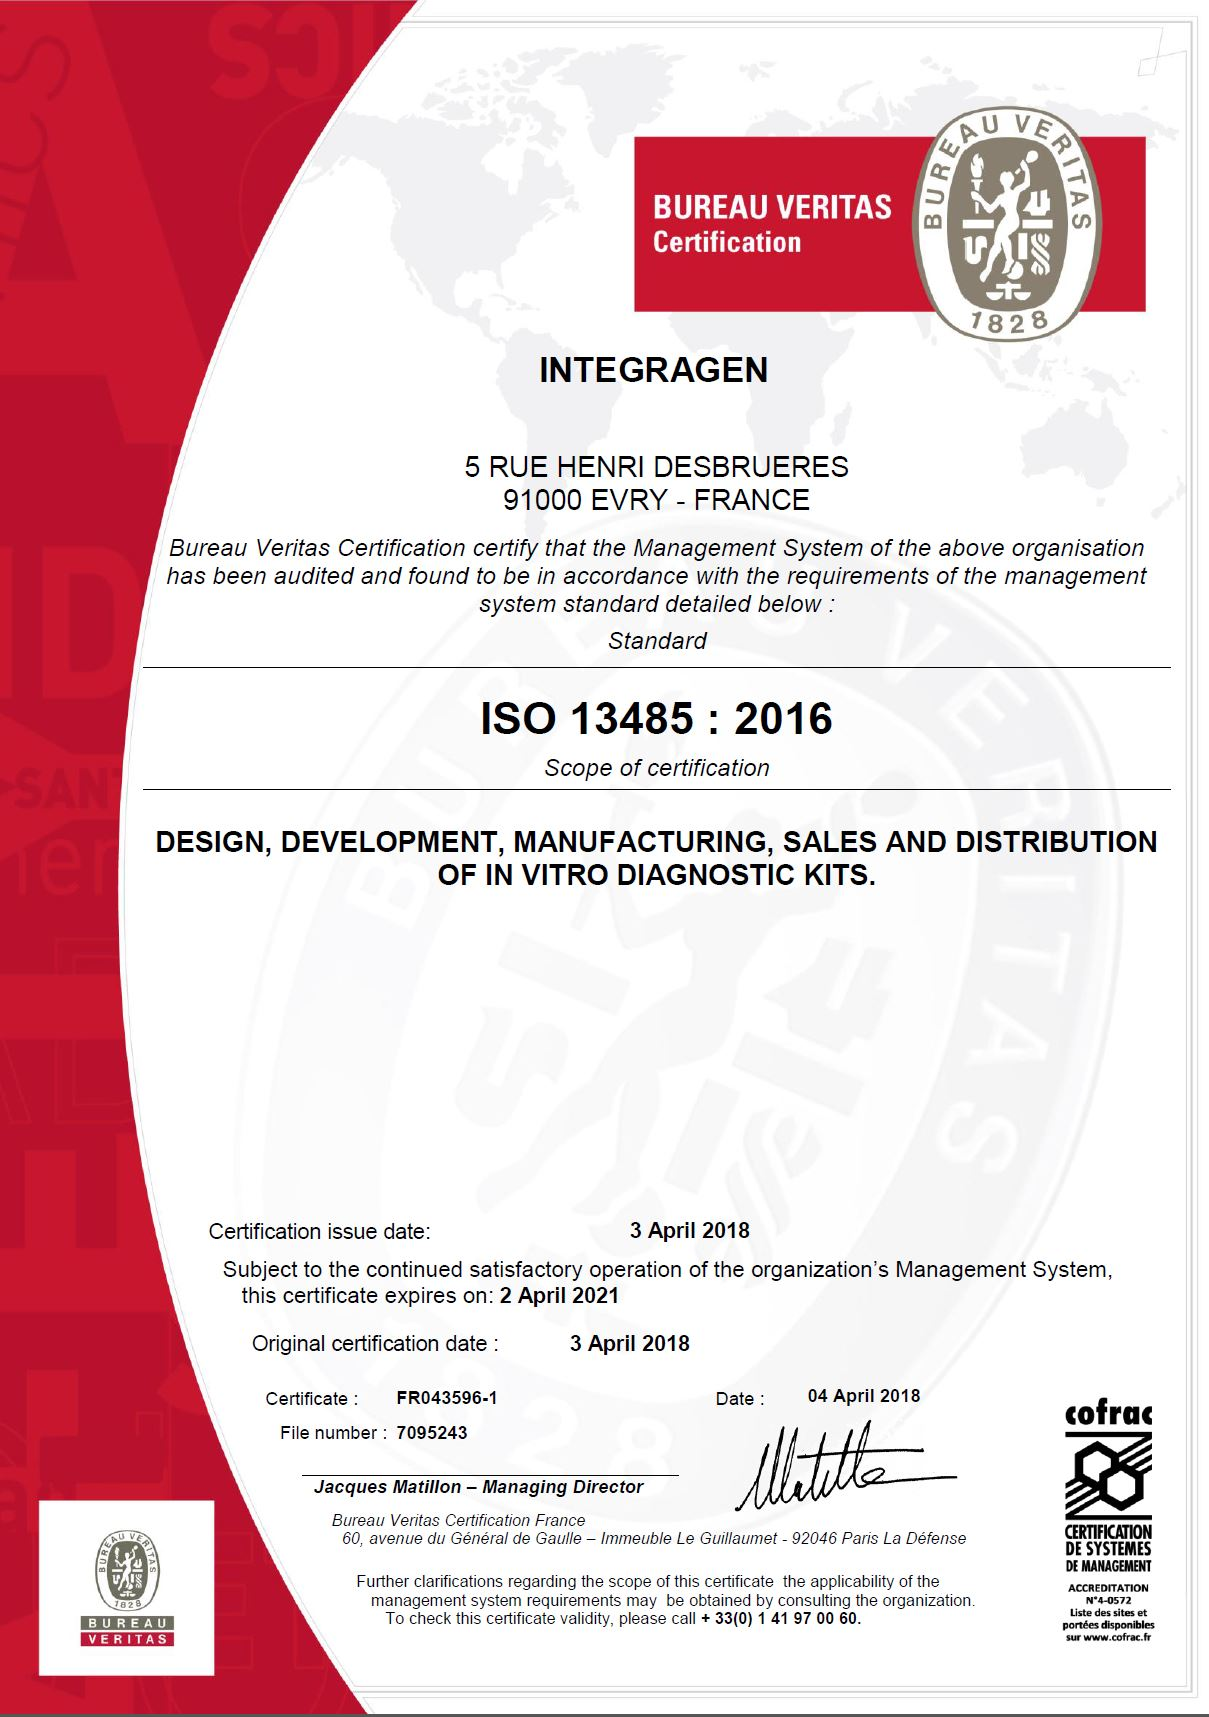 Iso 134852016 Certification Integragen